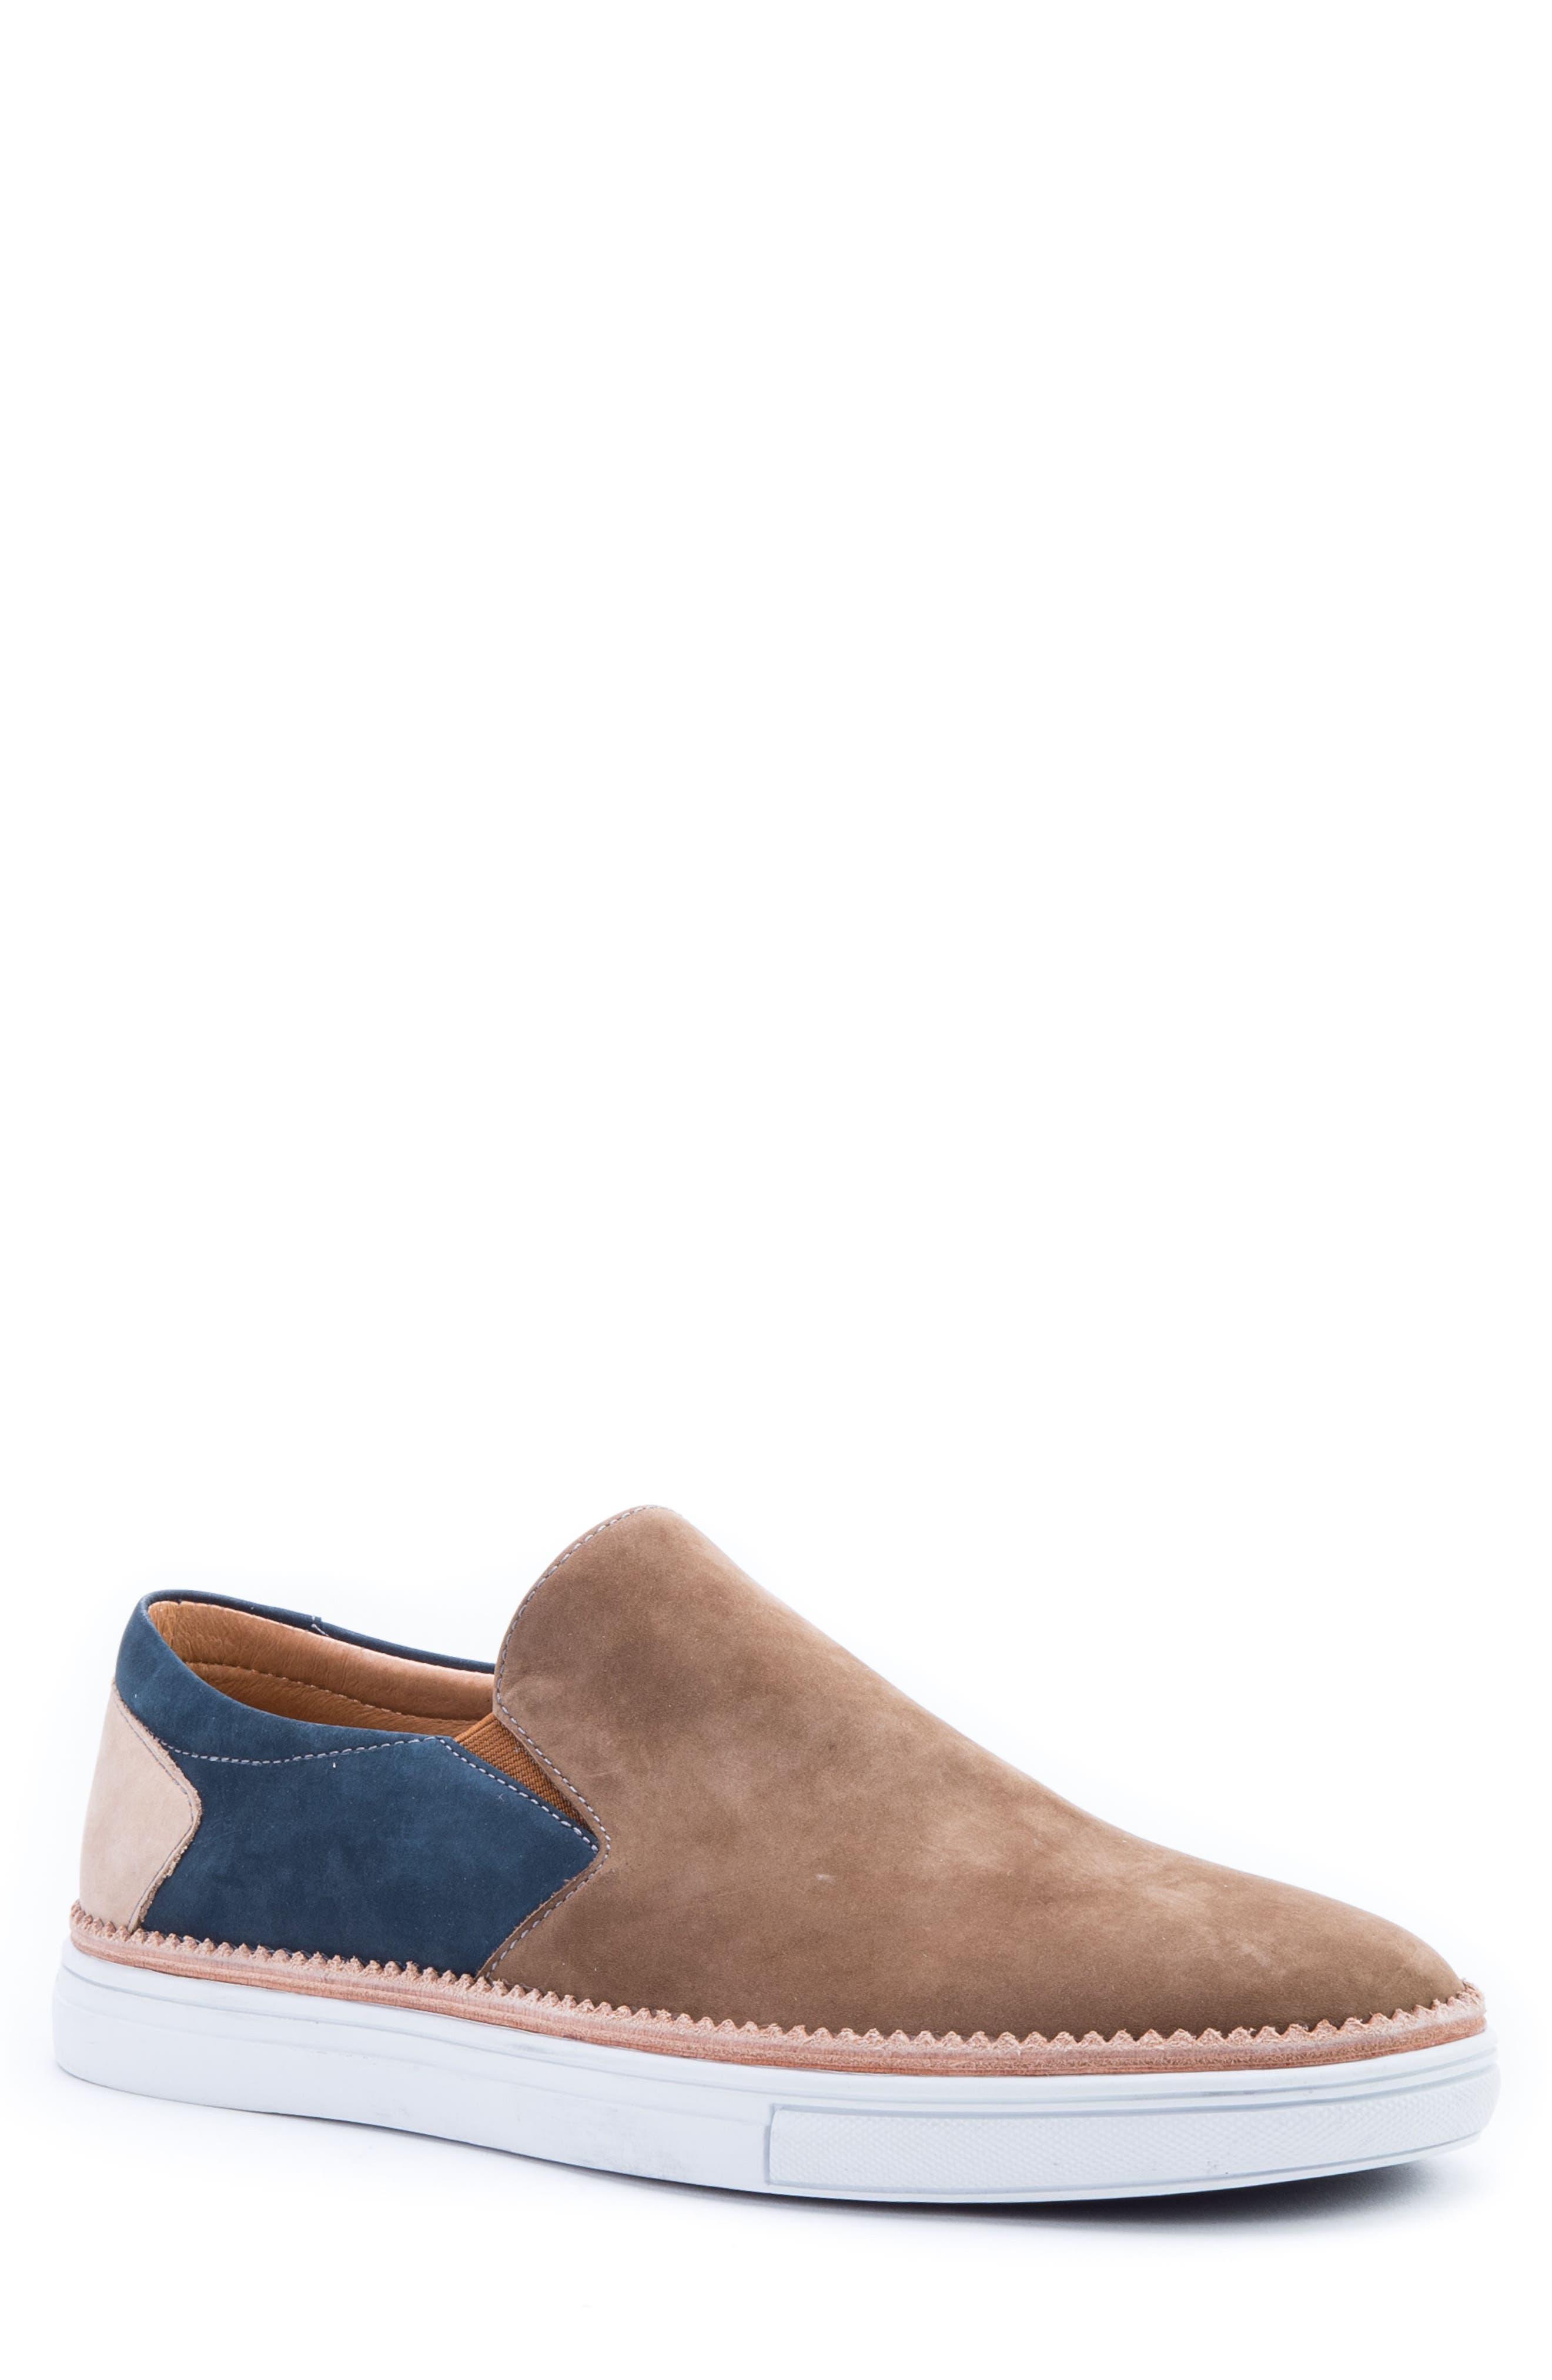 Zanzara Rivera Colorblocked Slip-On Sneaker- Brown